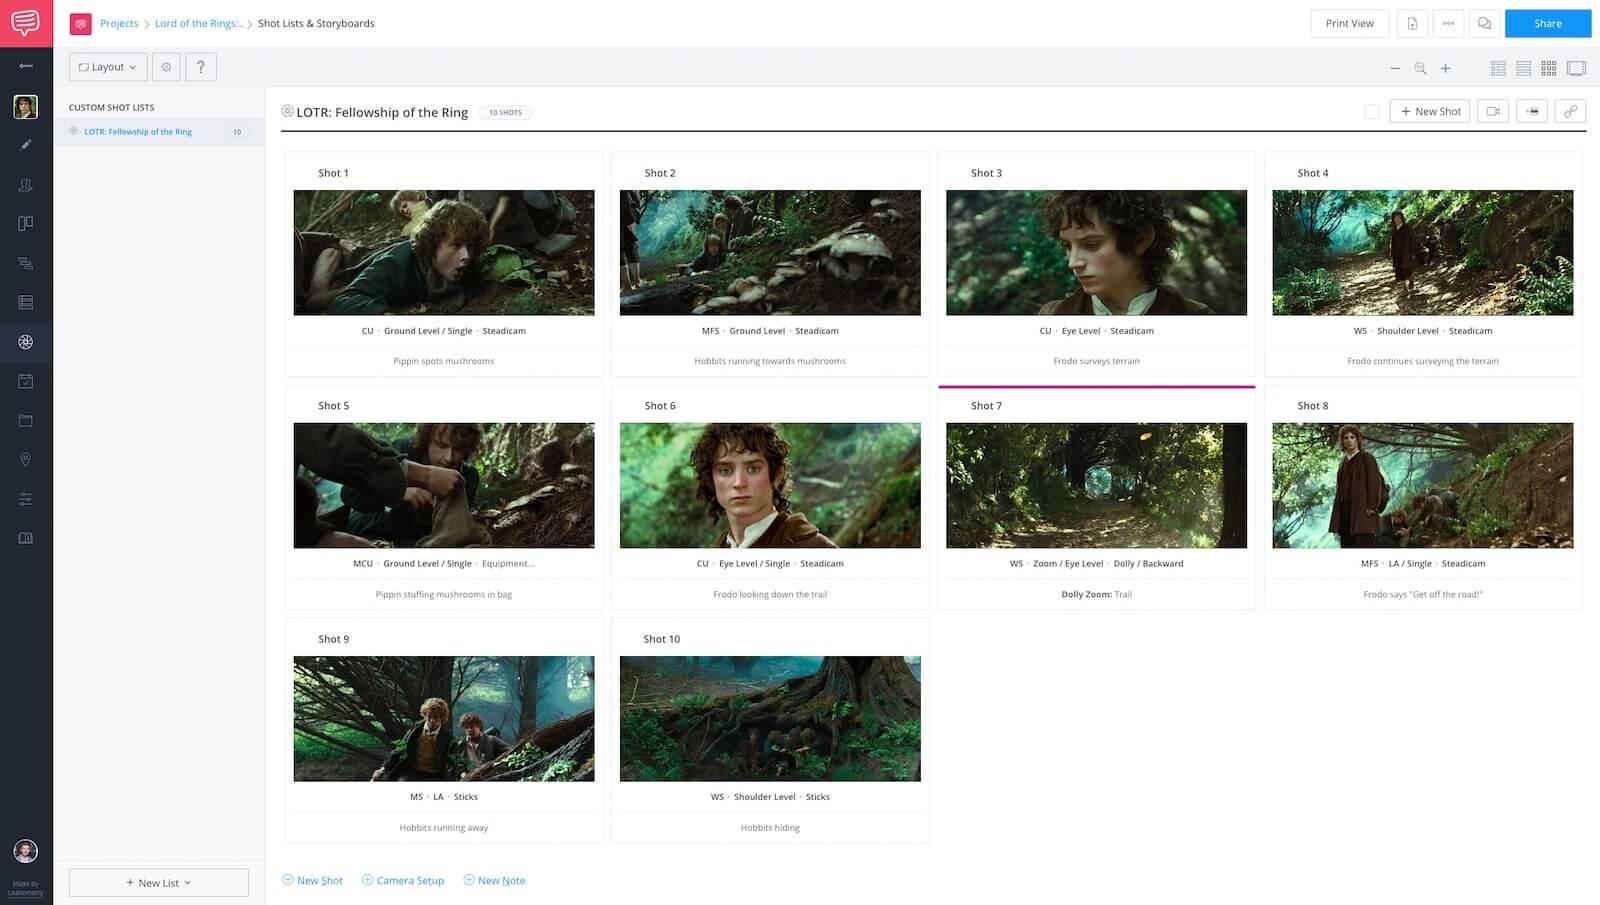 Dolly Zoom Vertigo - Lord of the Rings Storyboard - StudioBinder Shot List